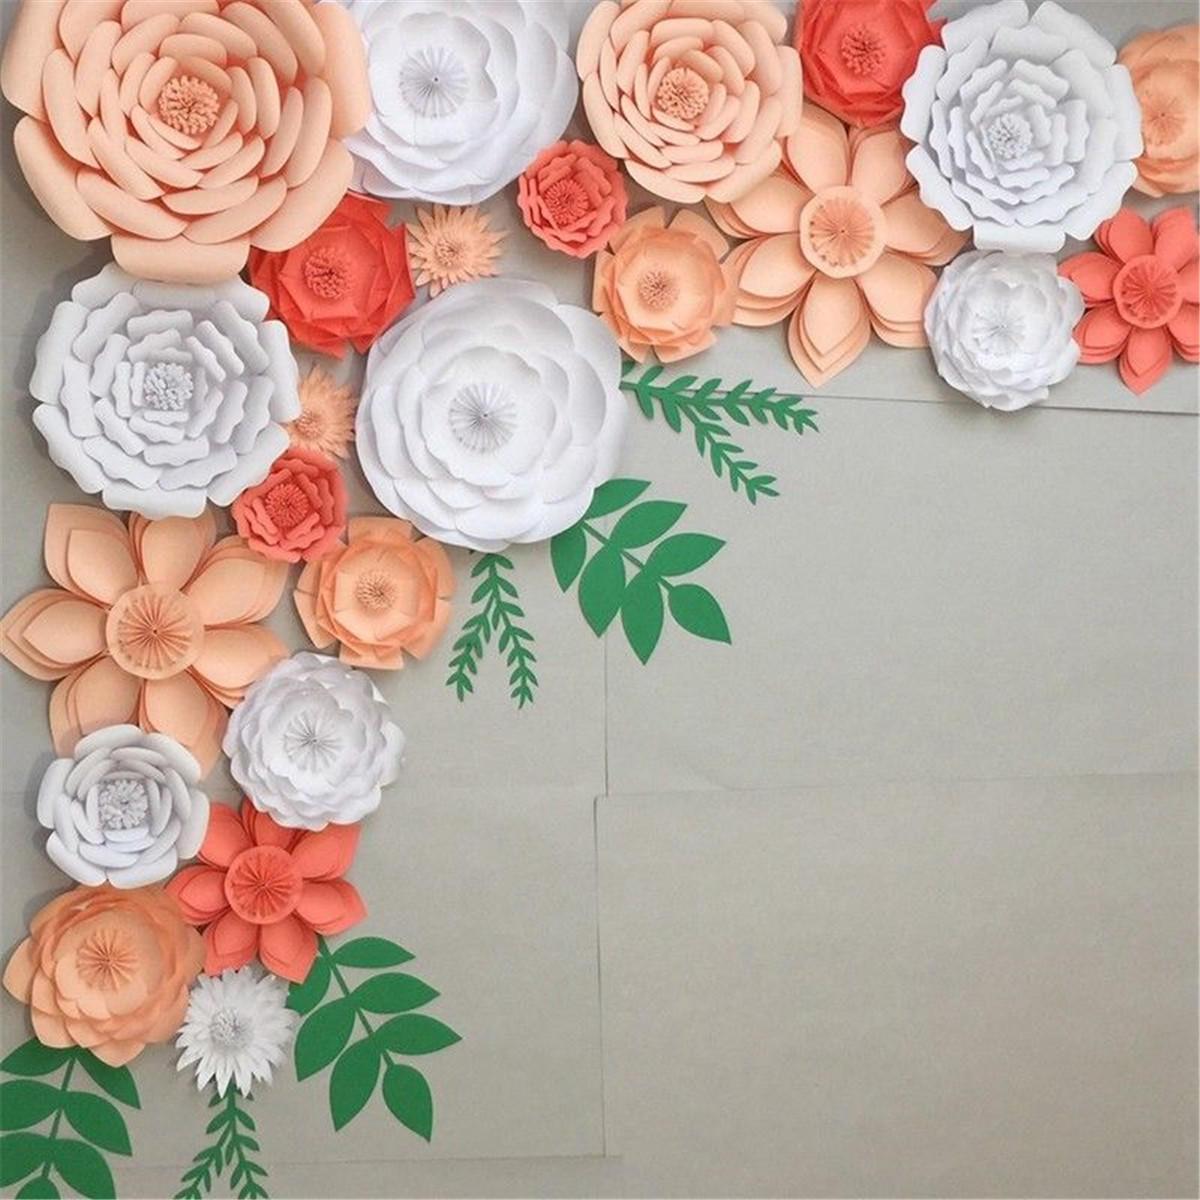 30cm diy paper flowers leaves backdrop decorations kid birthday rh banggood com